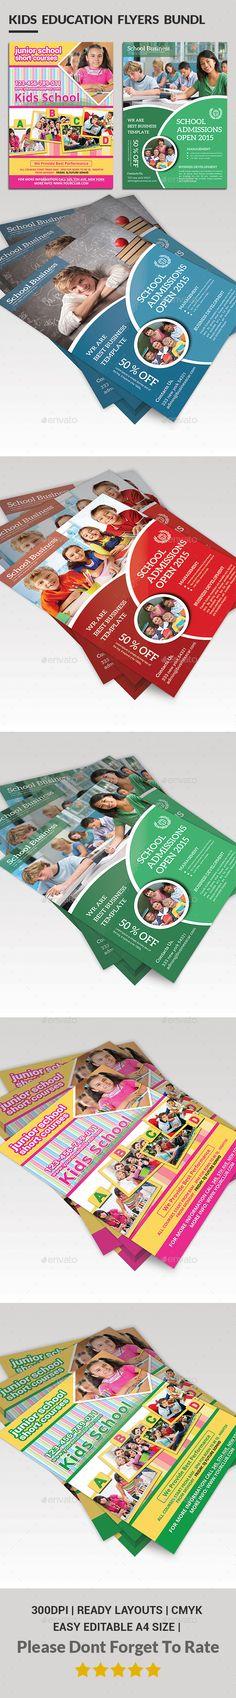 School Education Flyer Bundle Template PSD #design Download: http://graphicriver.net/item/school-education-flyer-bundle/13559806?ref=ksioks